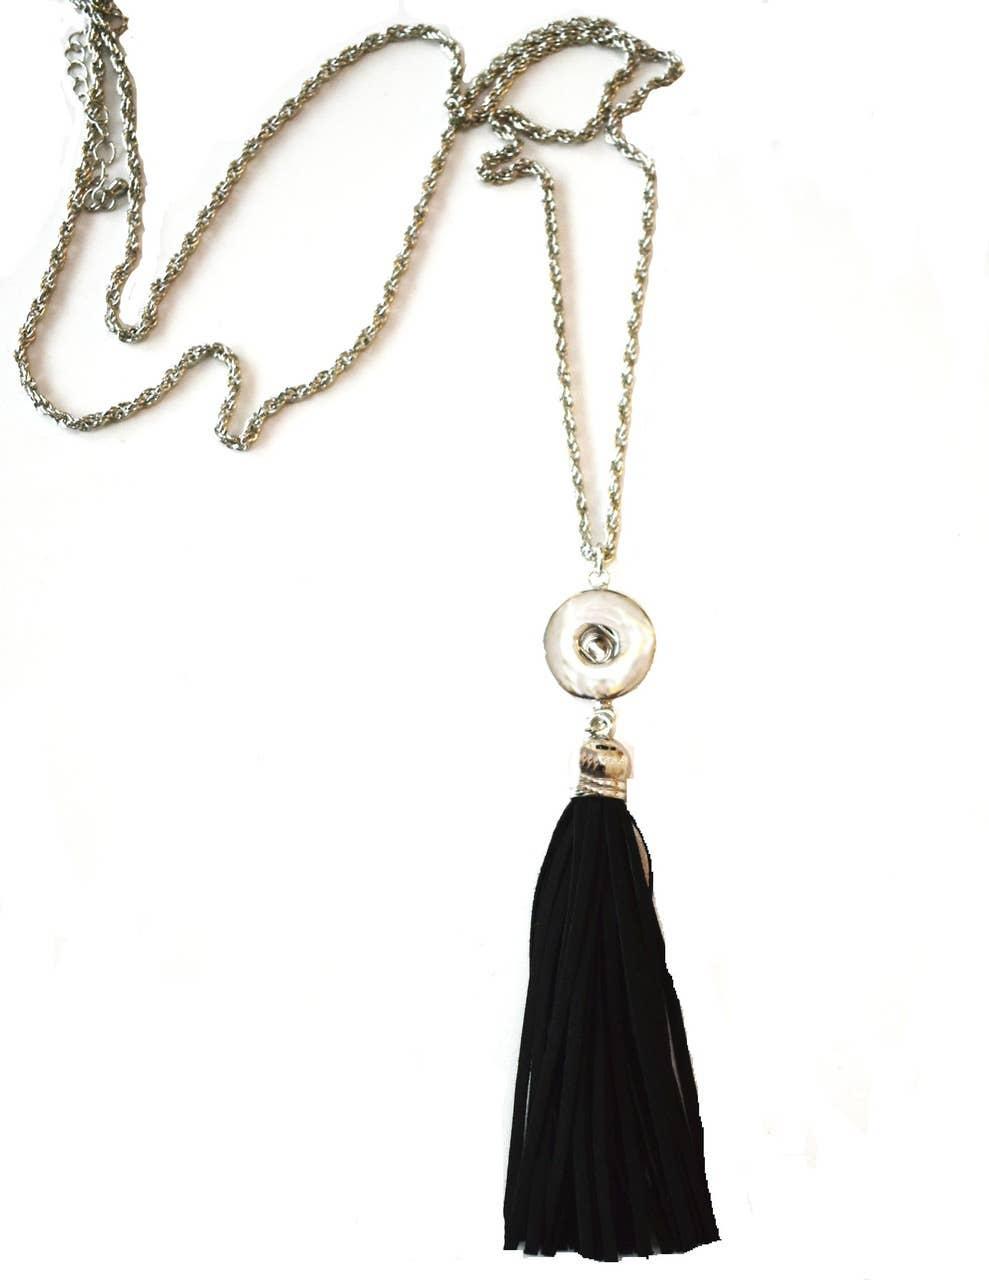 Snap Jewel Tassel Necklace - Black | Trada Marketplace